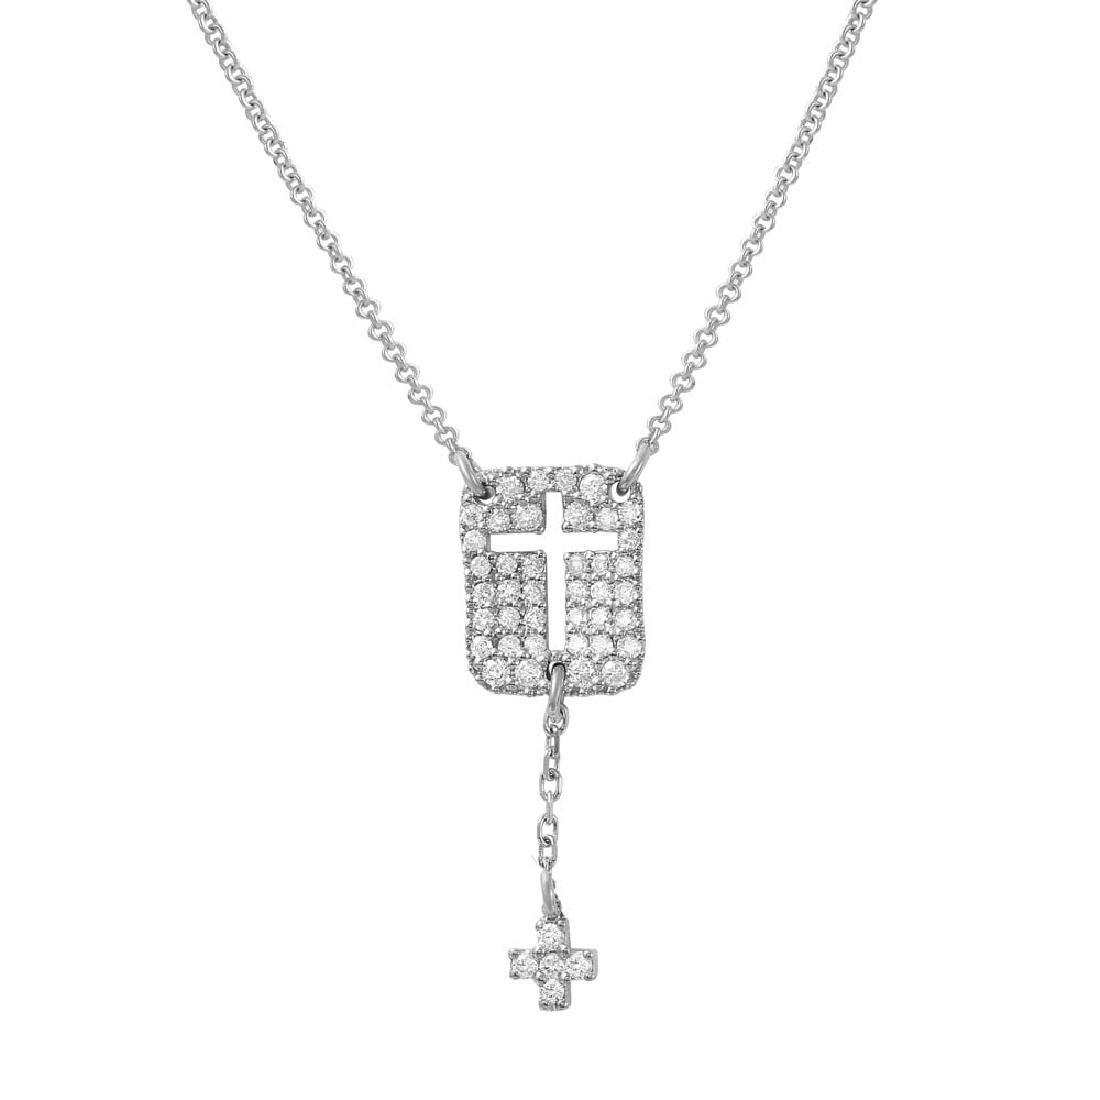 0.28 CTW 18K White Gold Ladies Necklace - REF-58H3W